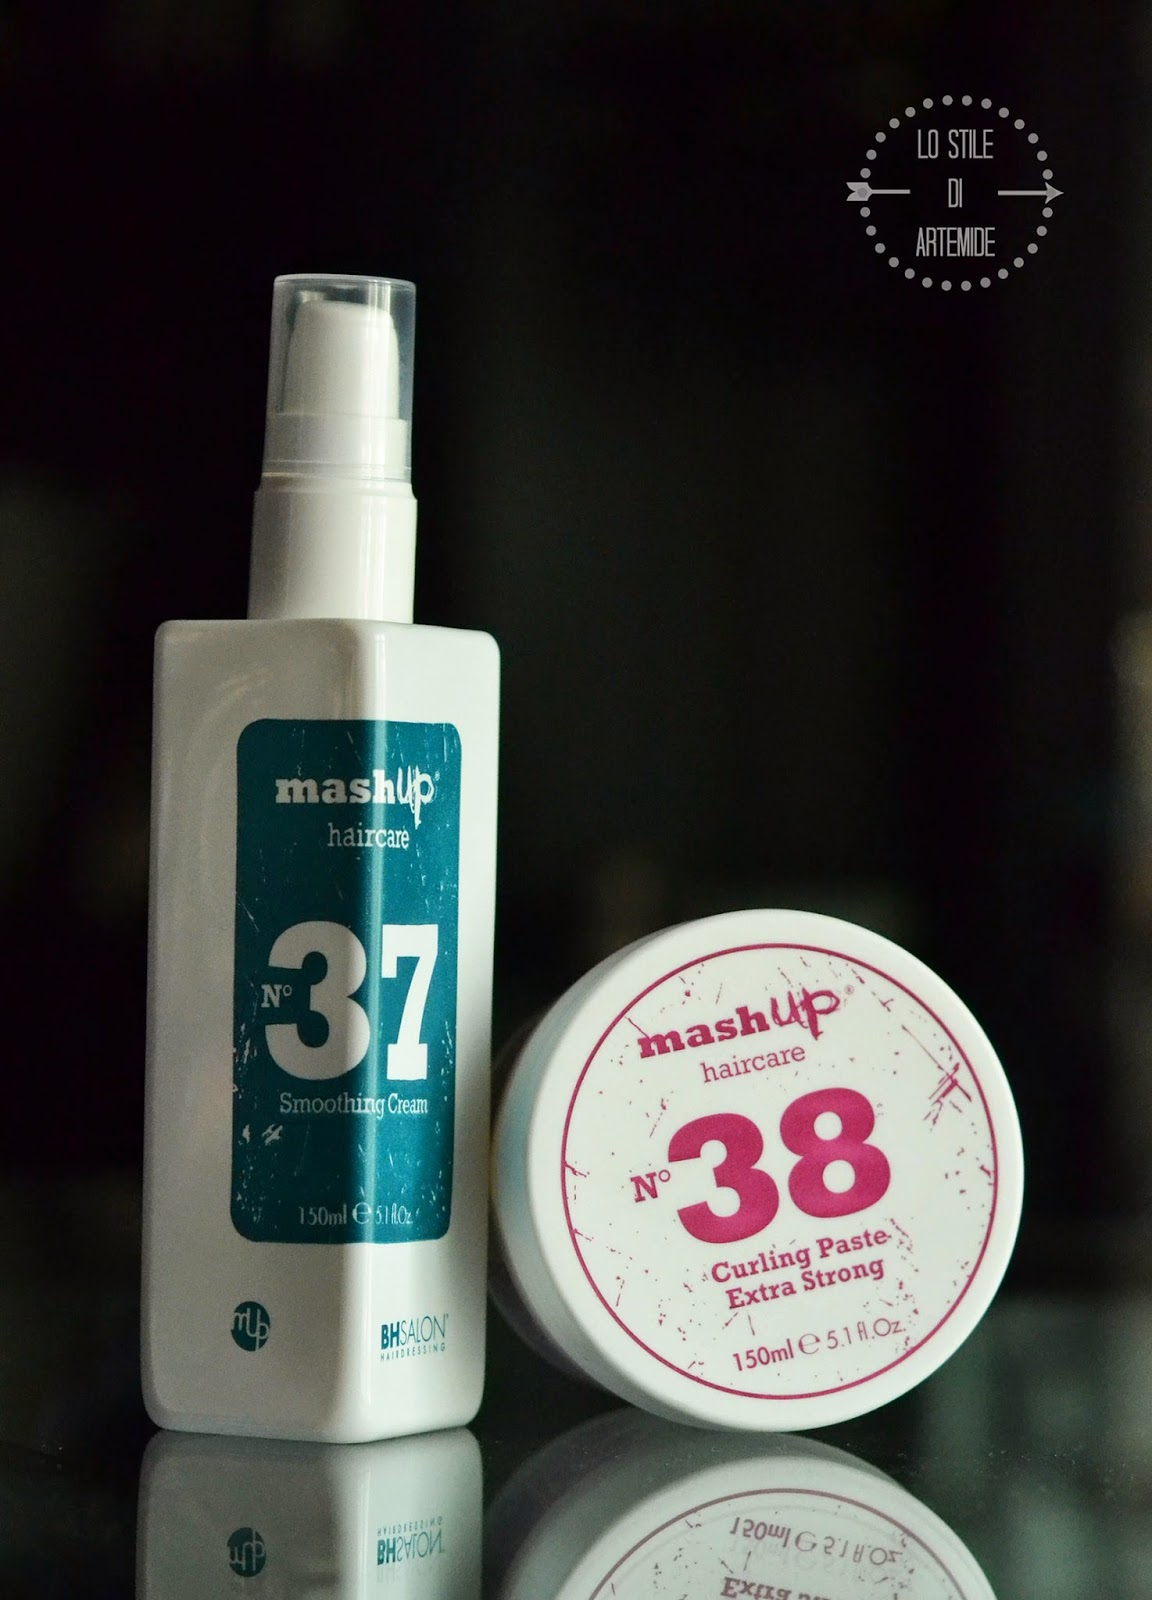 crema lisciante mashup hair care